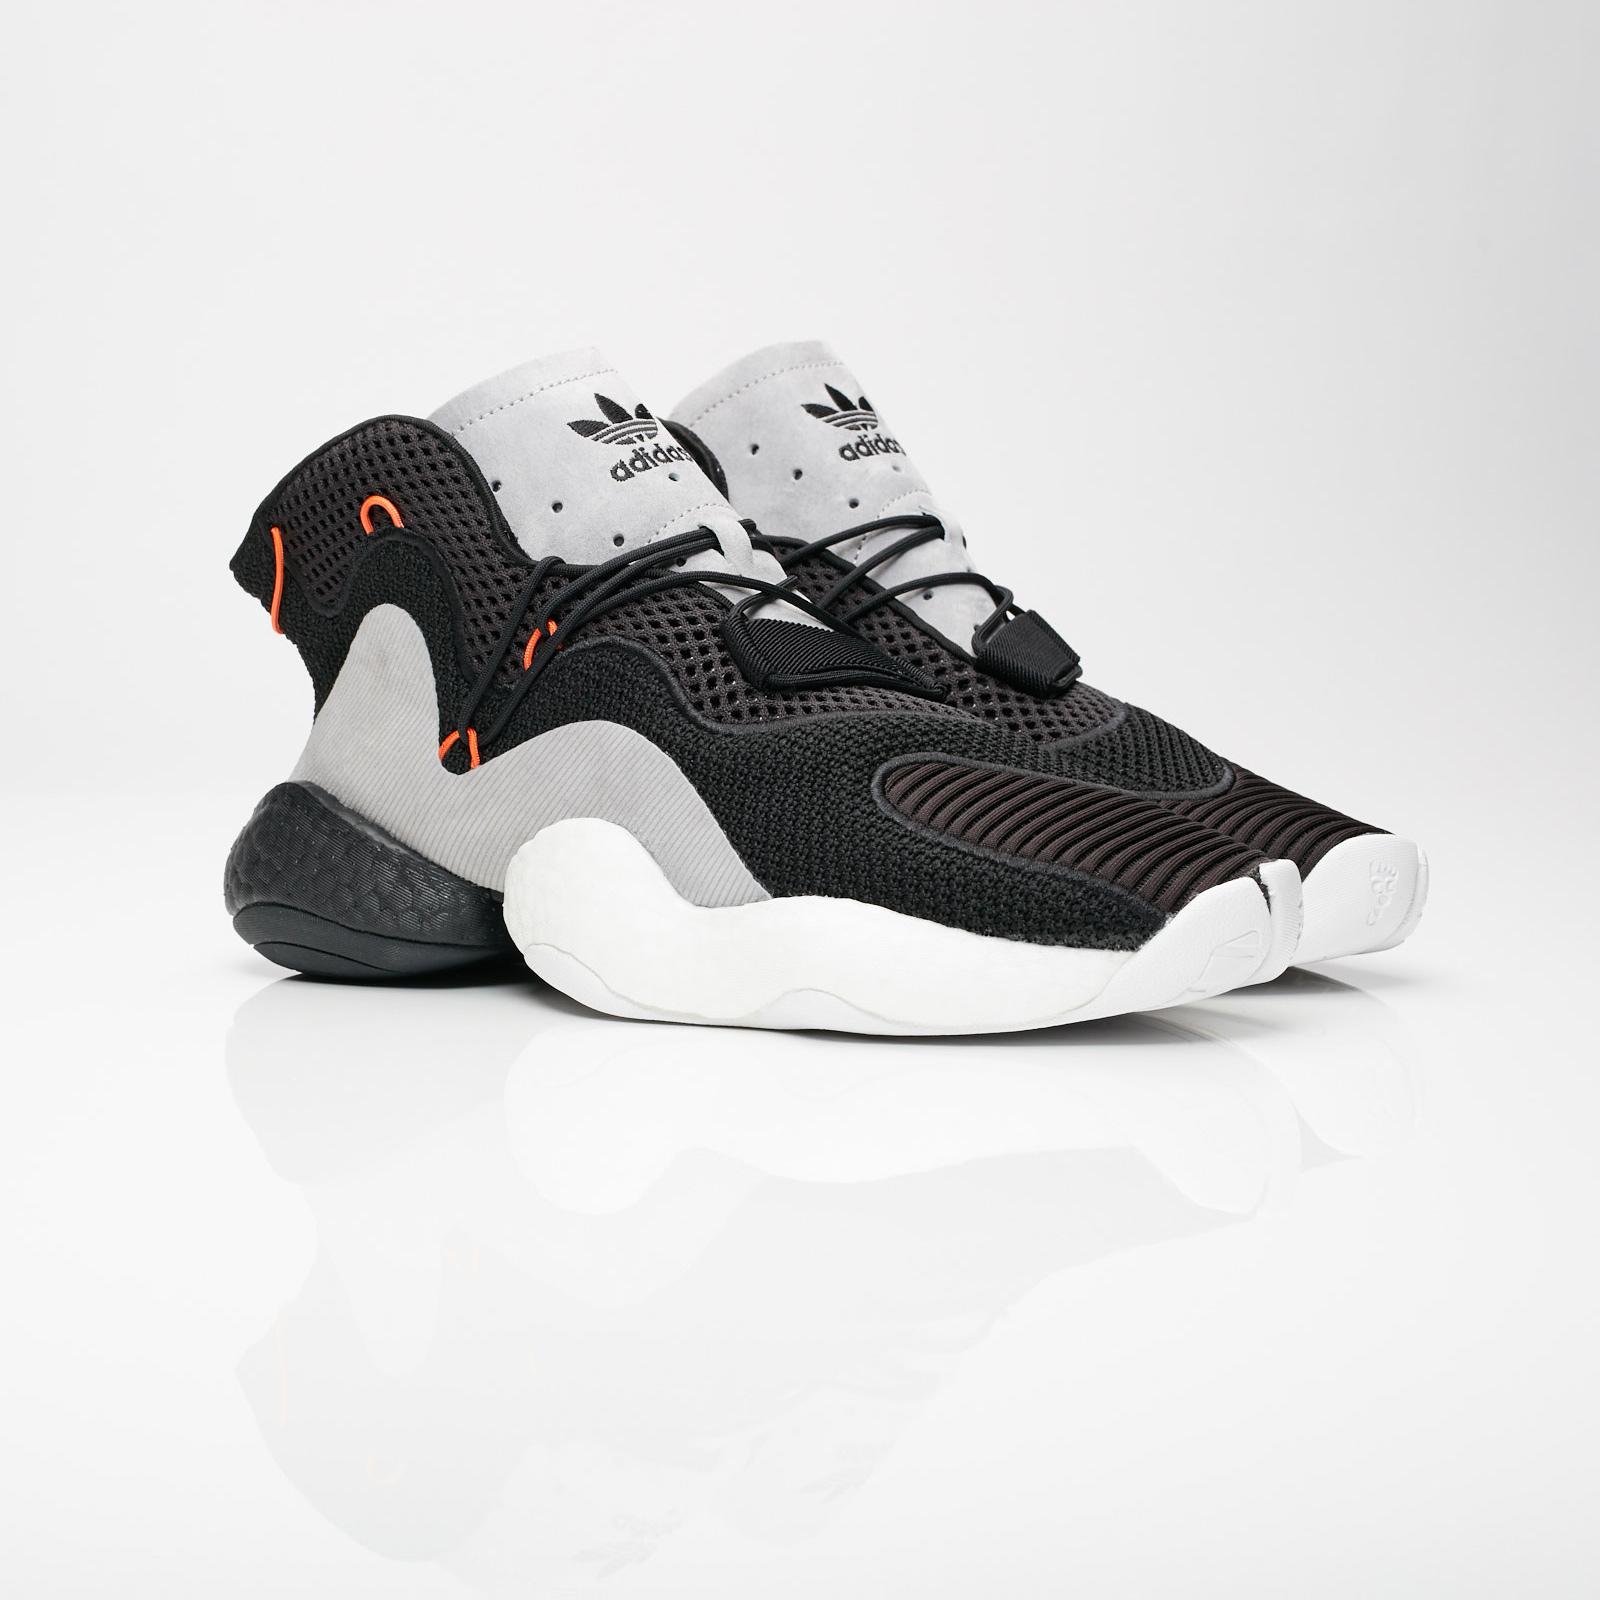 adidas Originals Crazy LVL 1 Boost You Wear Basketball White